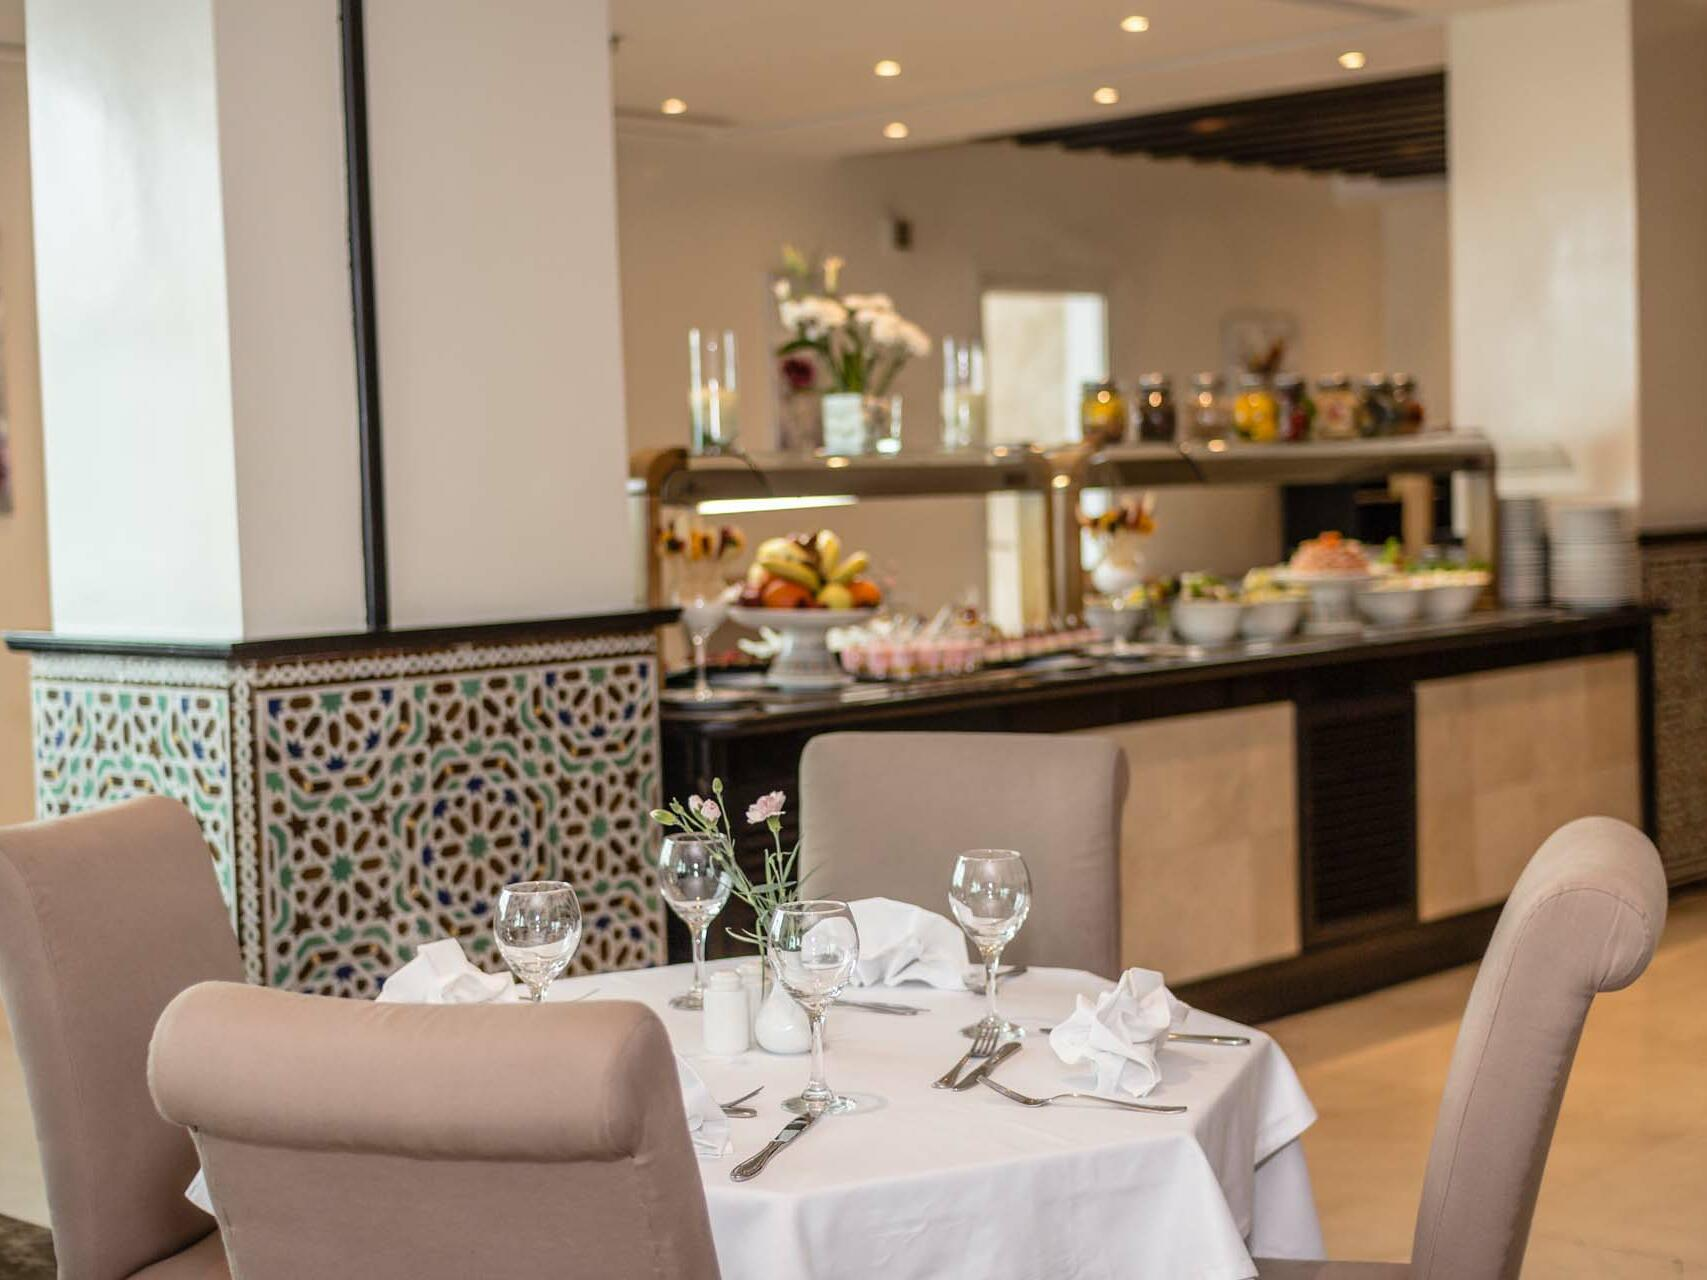 Dining Table next to the buffet - Farah Rabat Hotel